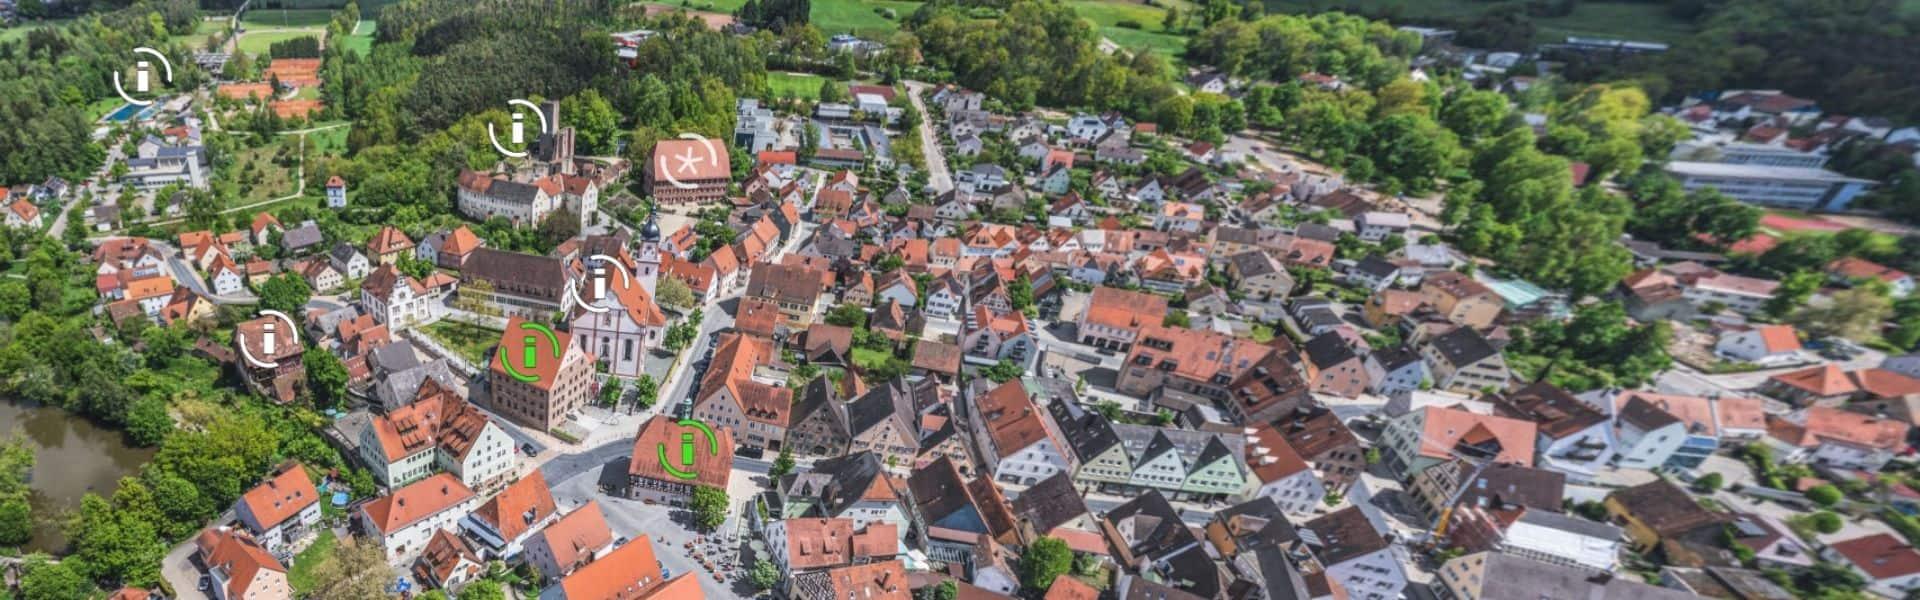 360 Grad Panorama Hilpoltstein